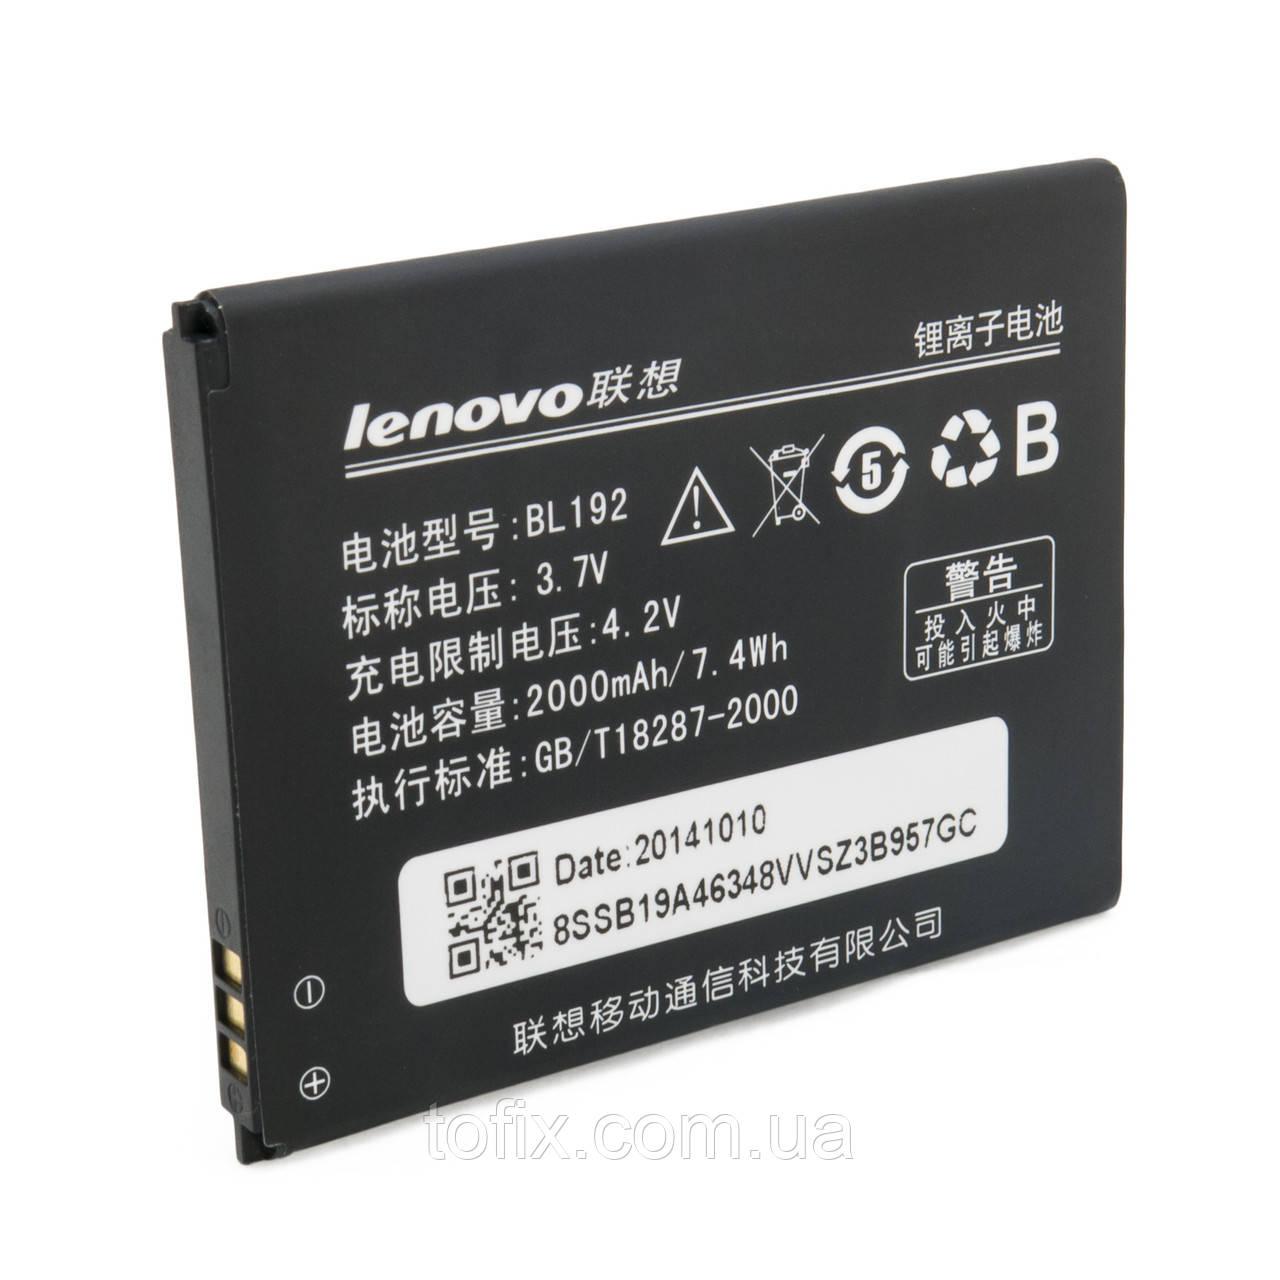 Батарея (акб, аккумулятор) BL192 для Lenovo A300 IdeaPhone, 2000 mAh, оригинал